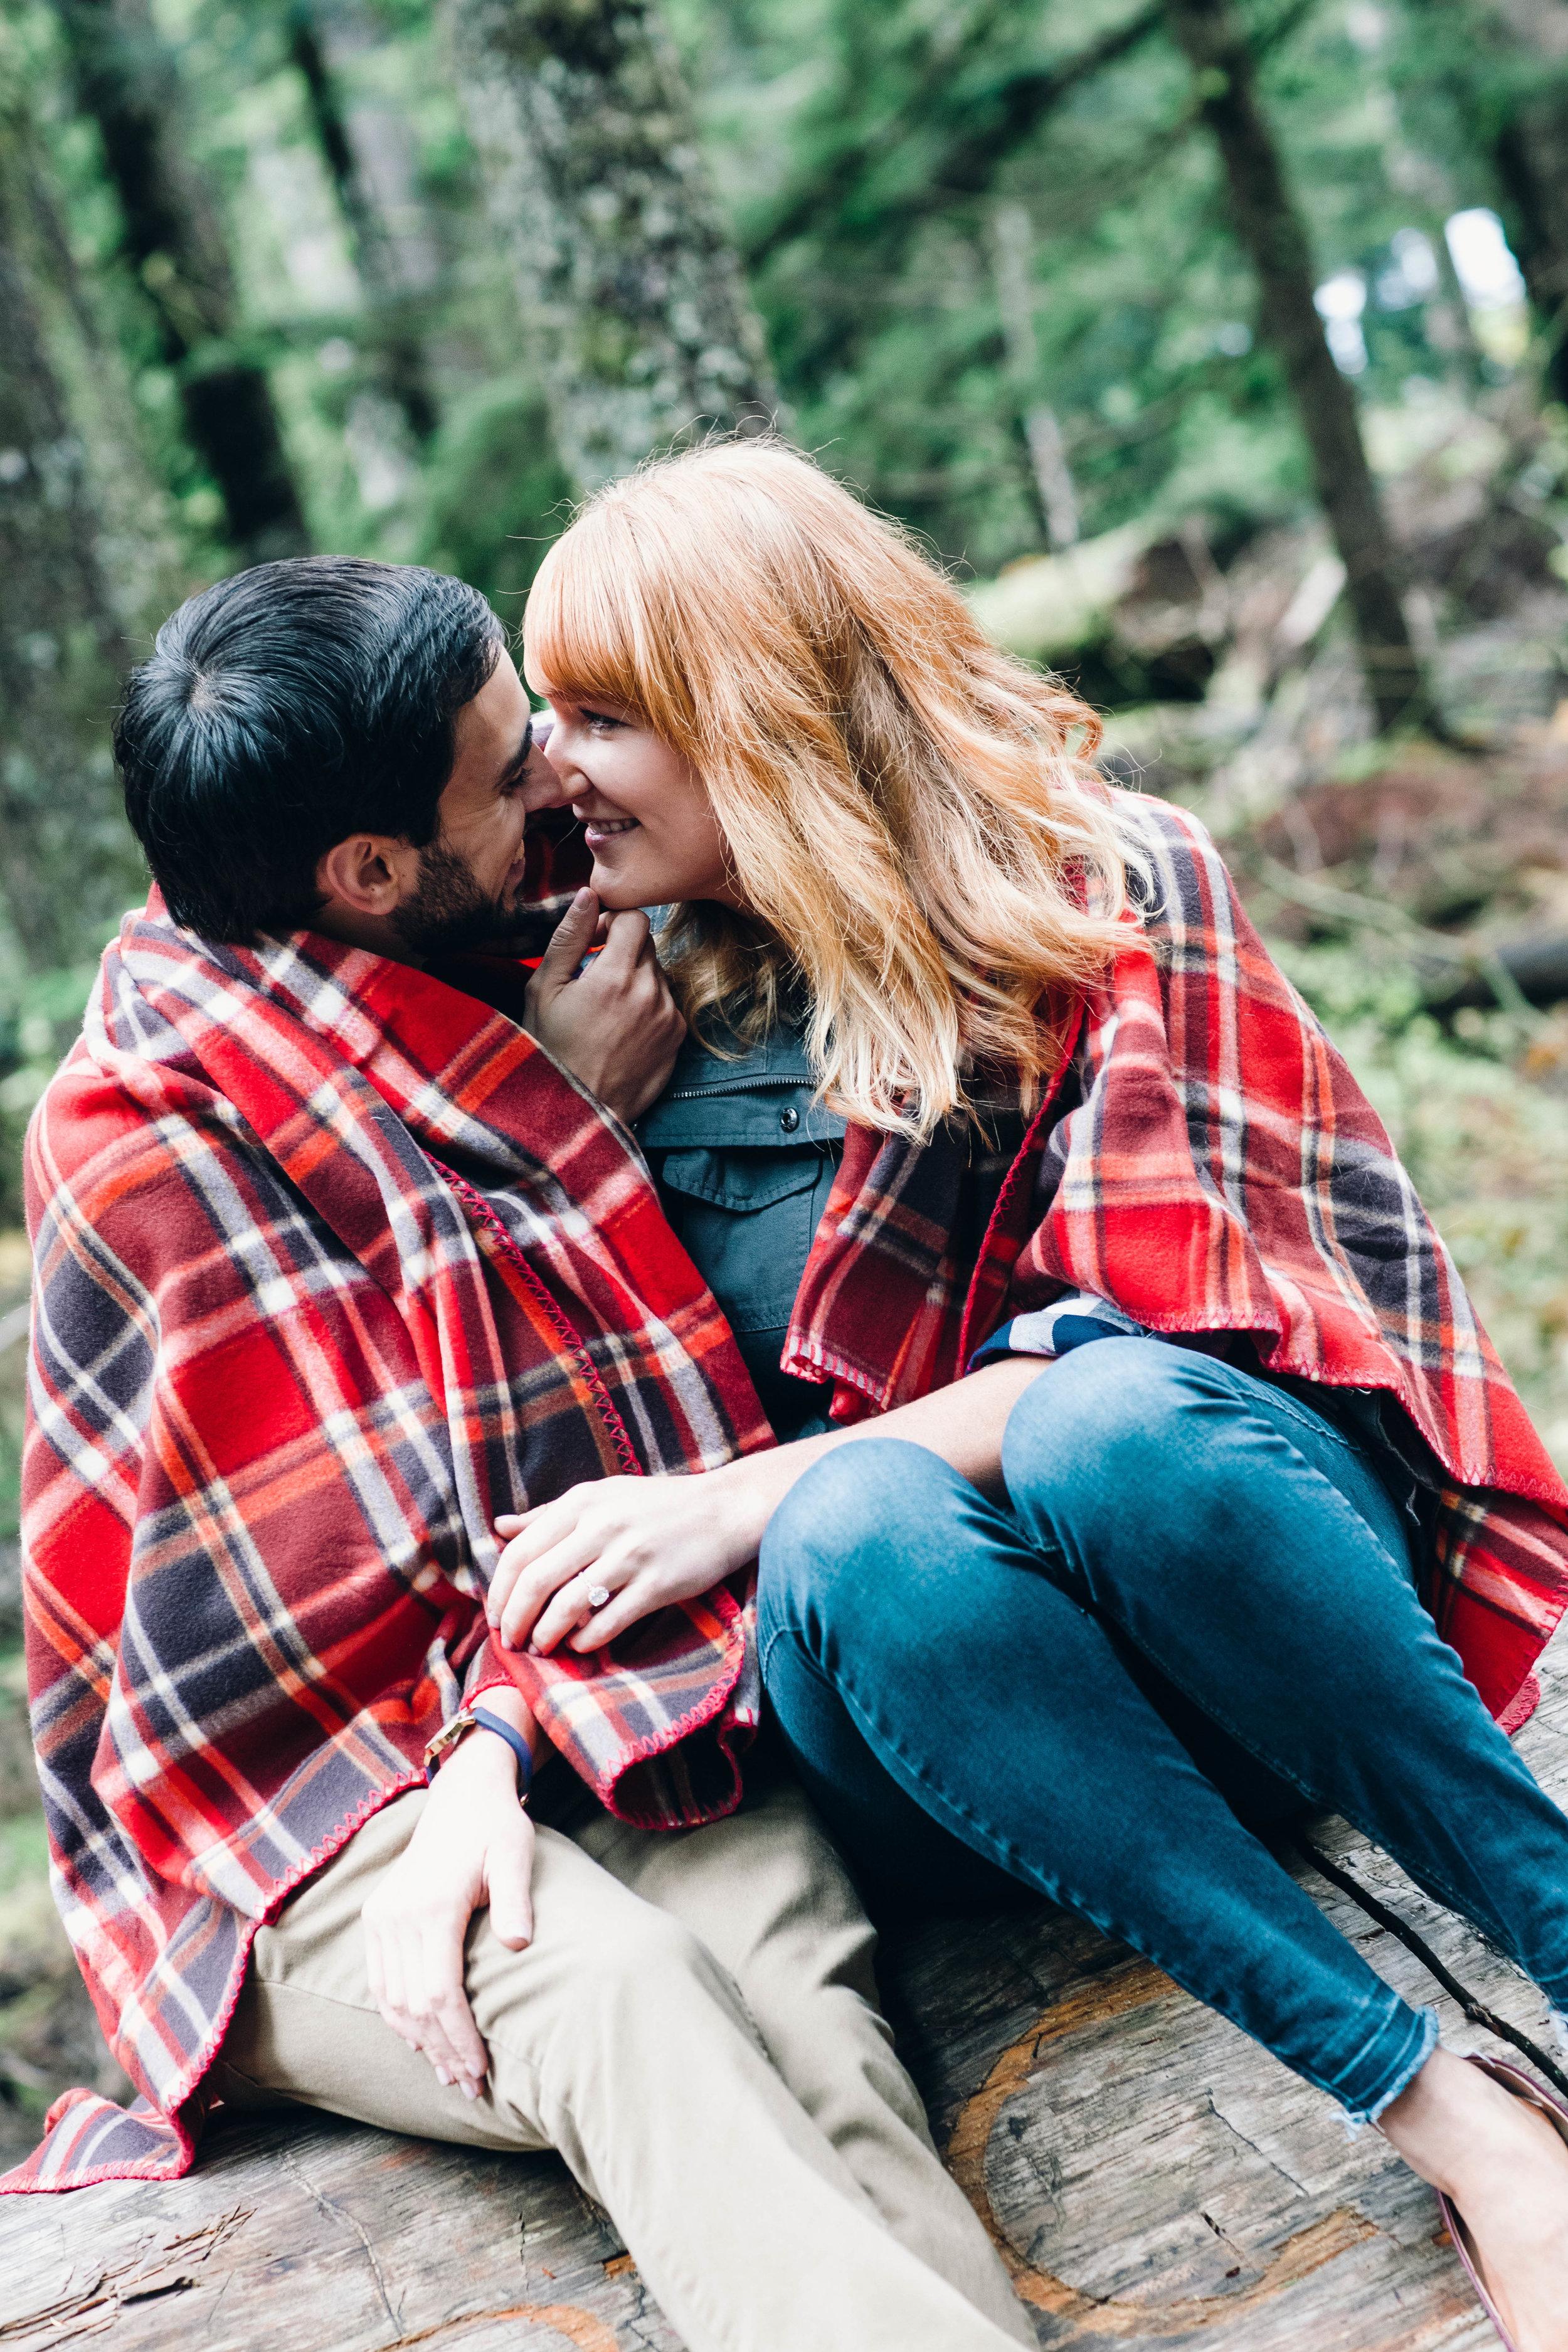 Ryan+Nicole_Franklin+Falls+Engagement_APW2016_22.JPG